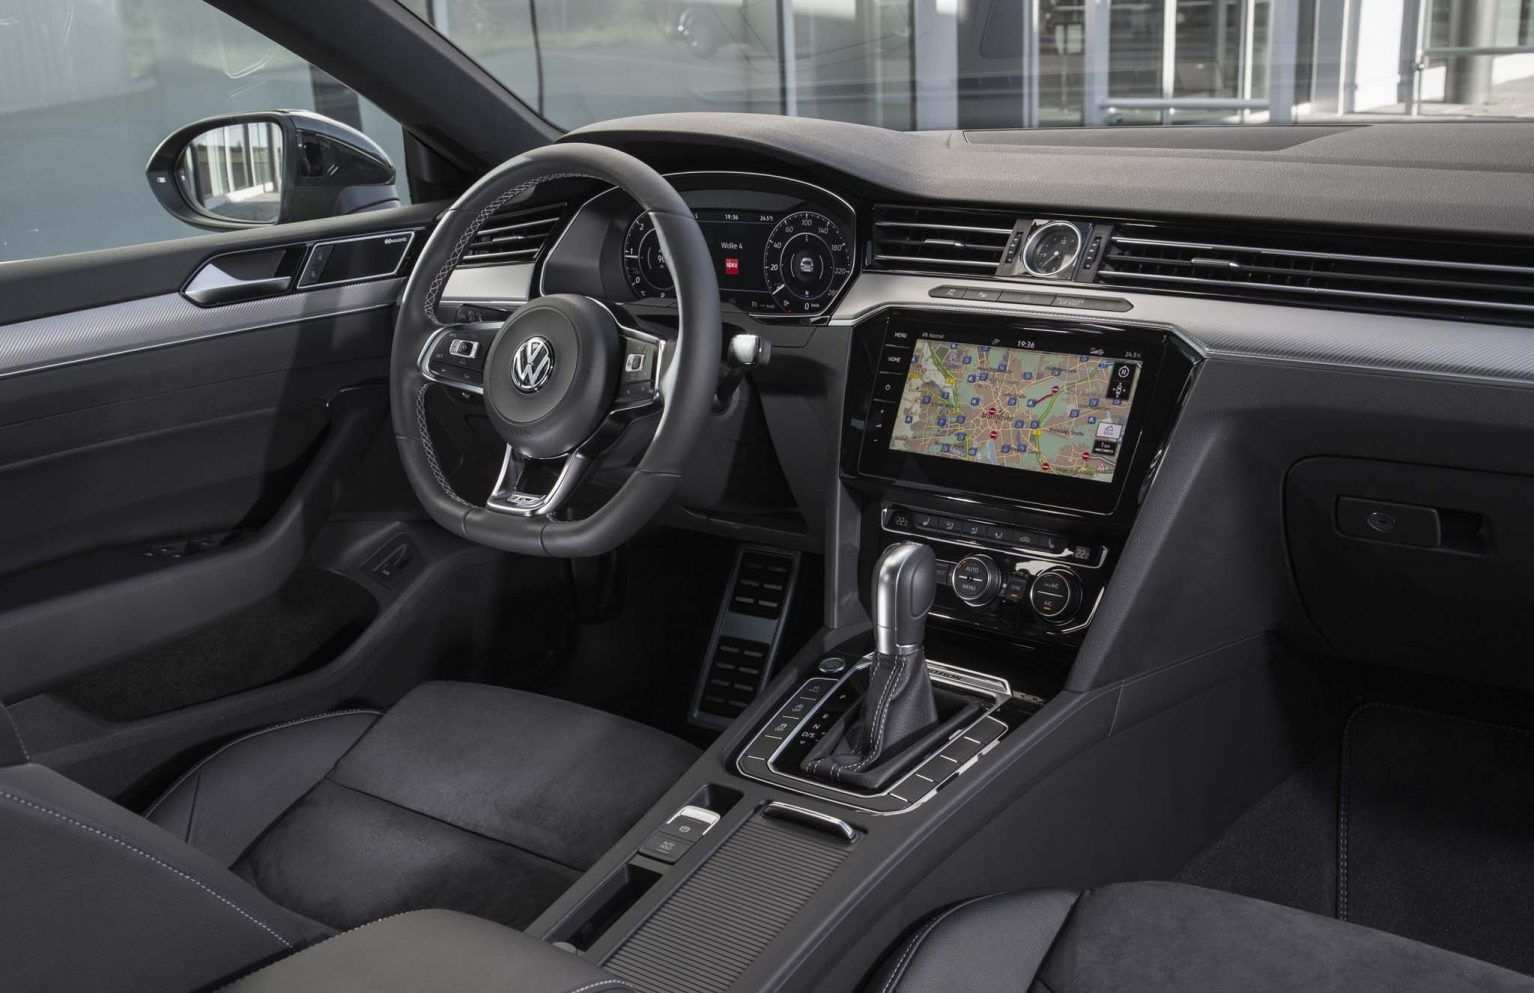 85 The New Volkswagen 2019 Passat Concept Prices with New Volkswagen 2019 Passat Concept